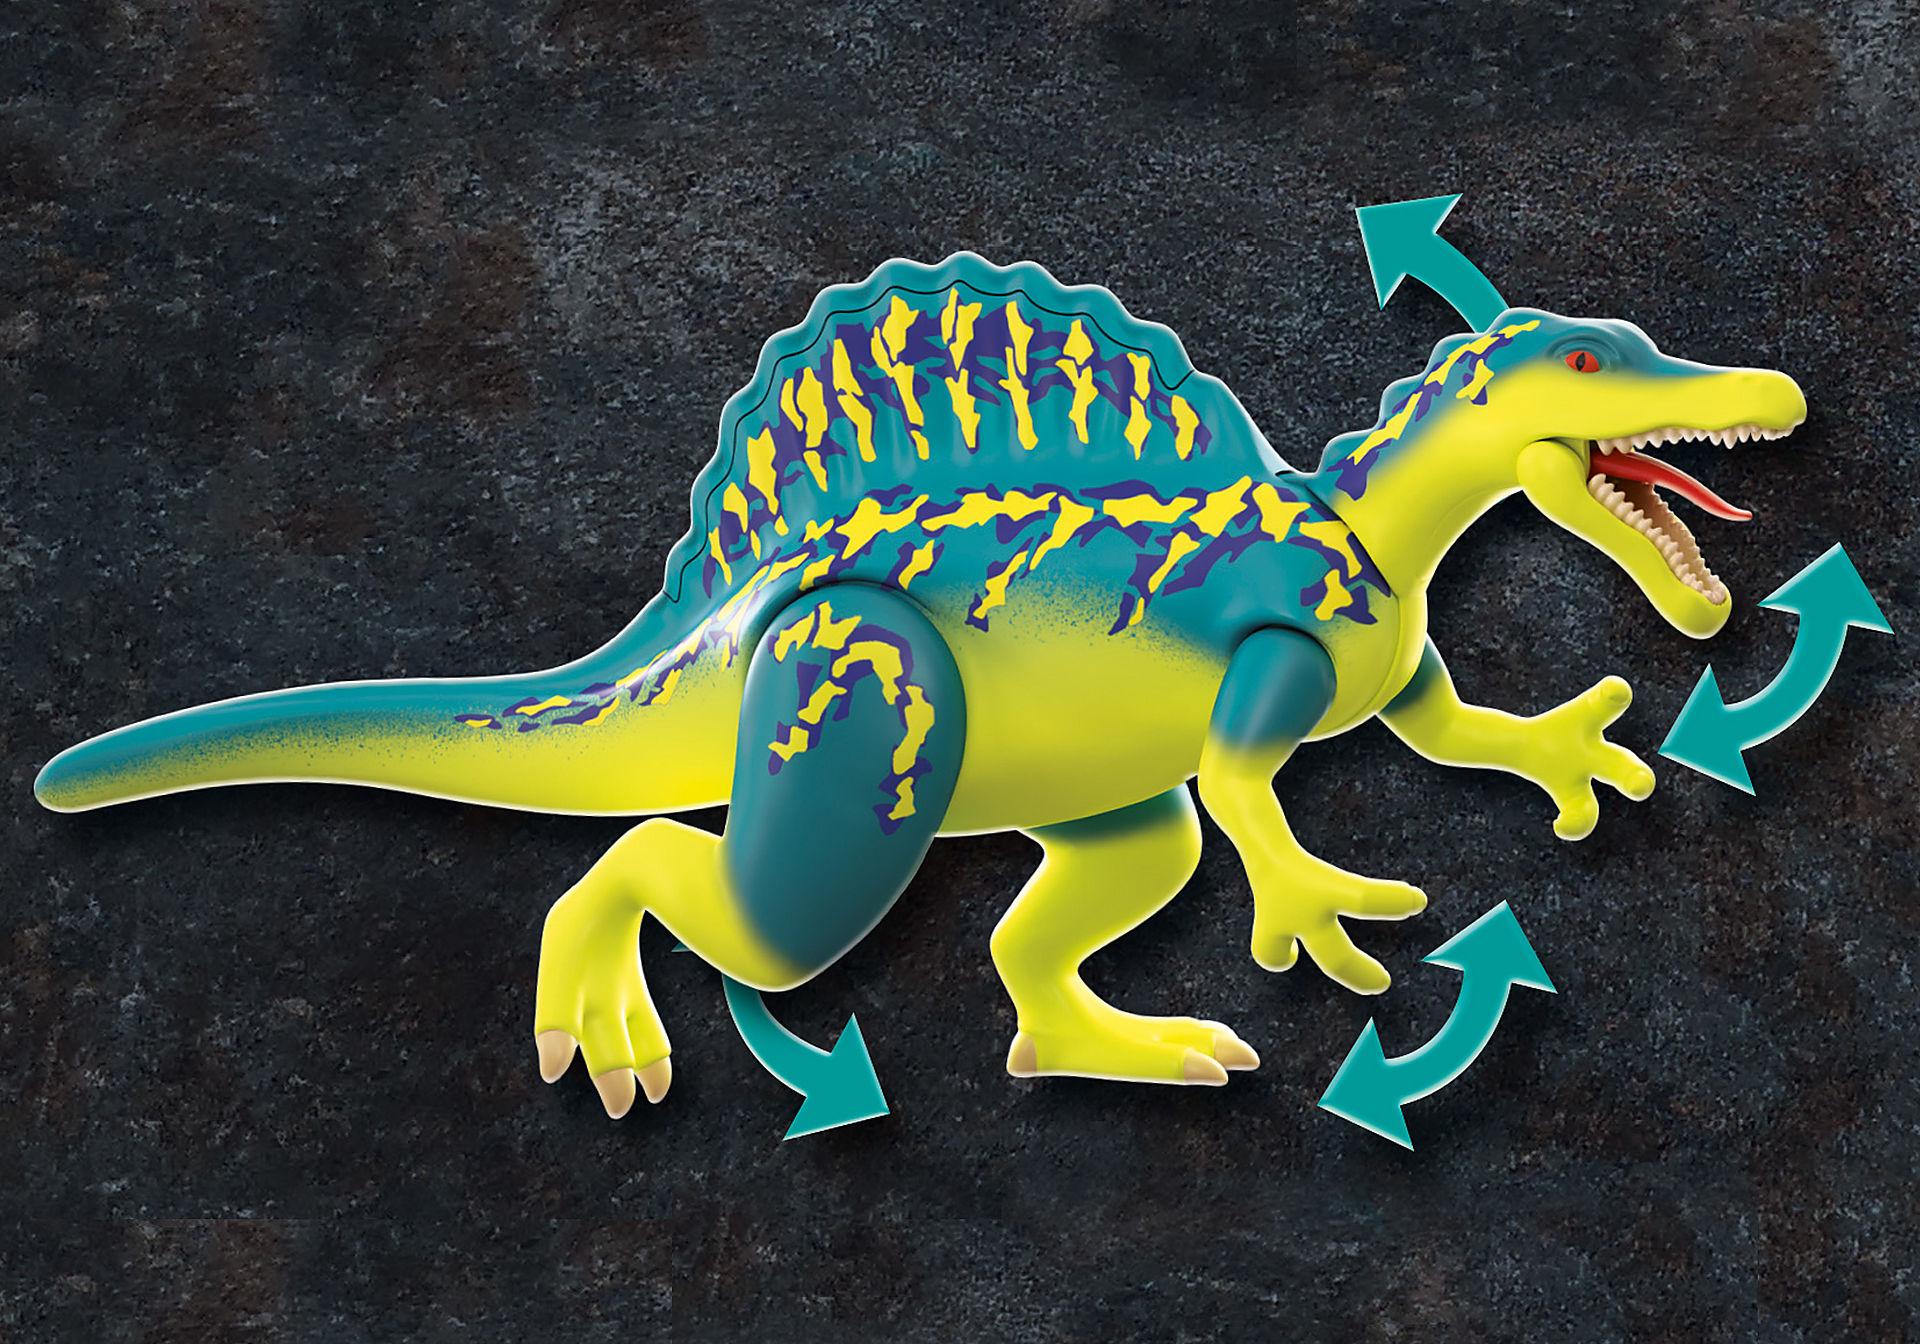 70625 Spinosaurus: Double Defense Power zoom image4